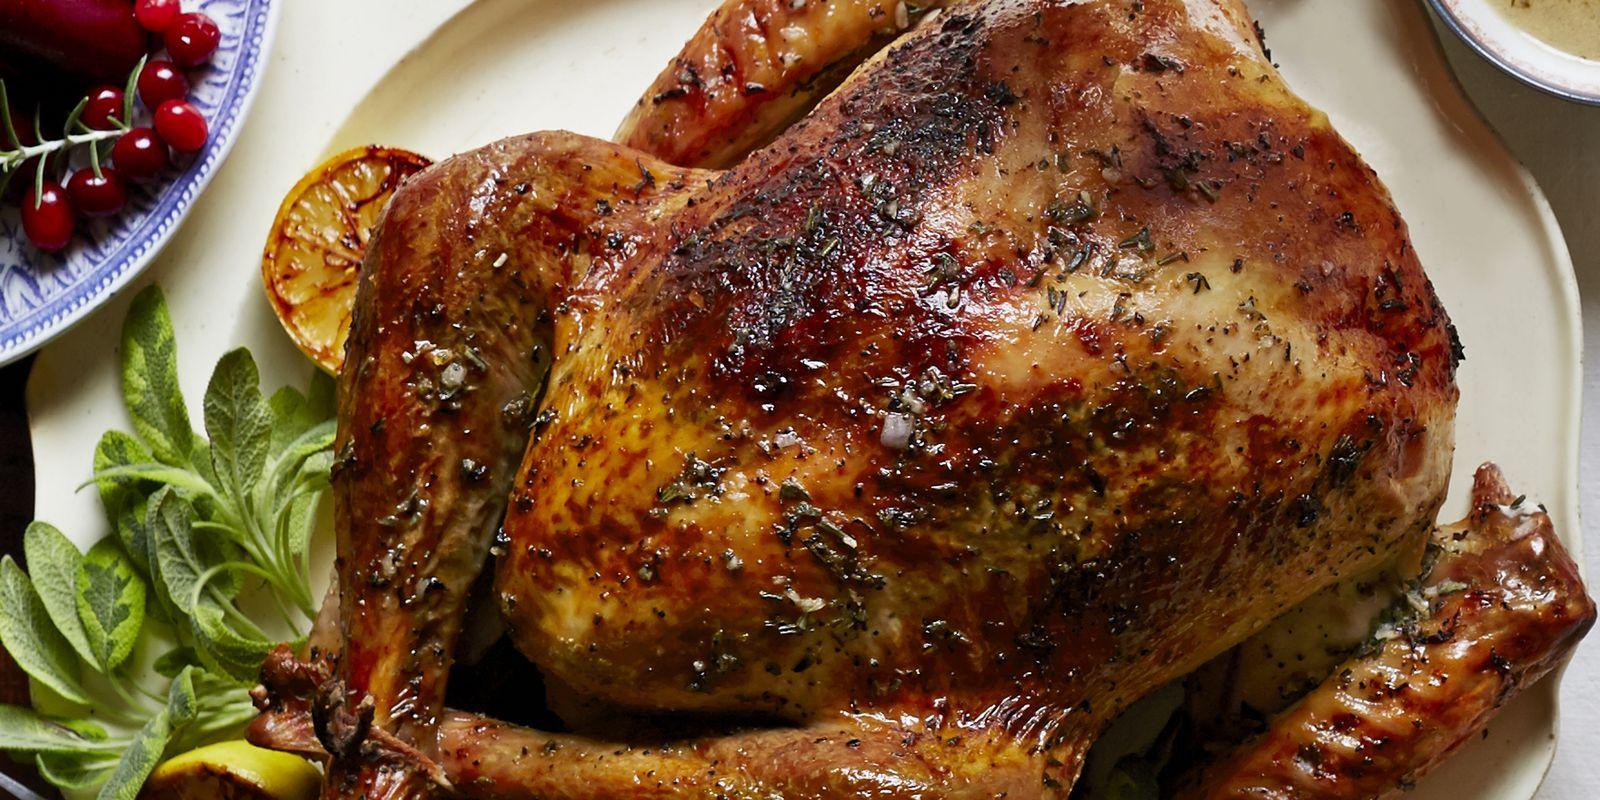 Roast Turkey Recipes Thanksgiving  Herb and Citrus Butter Roasted Turkey Recipe